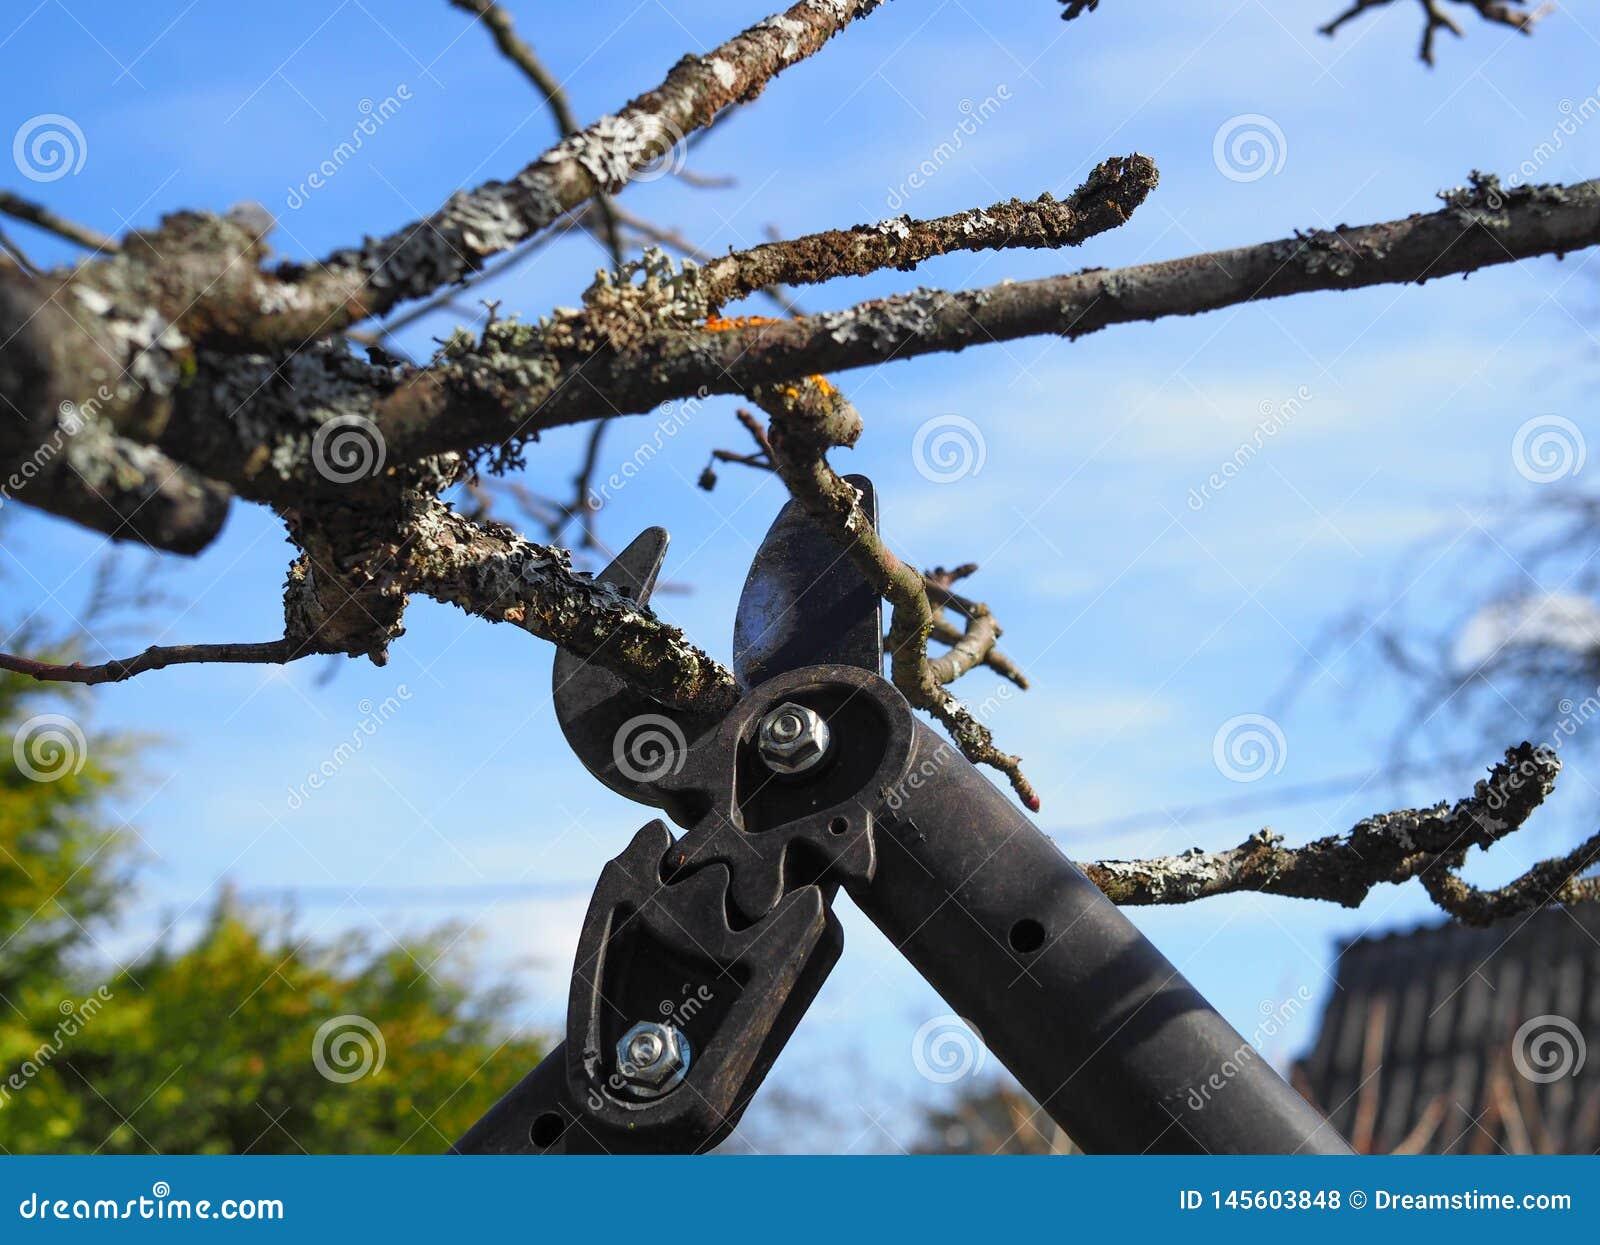 Spring pruning of treesn